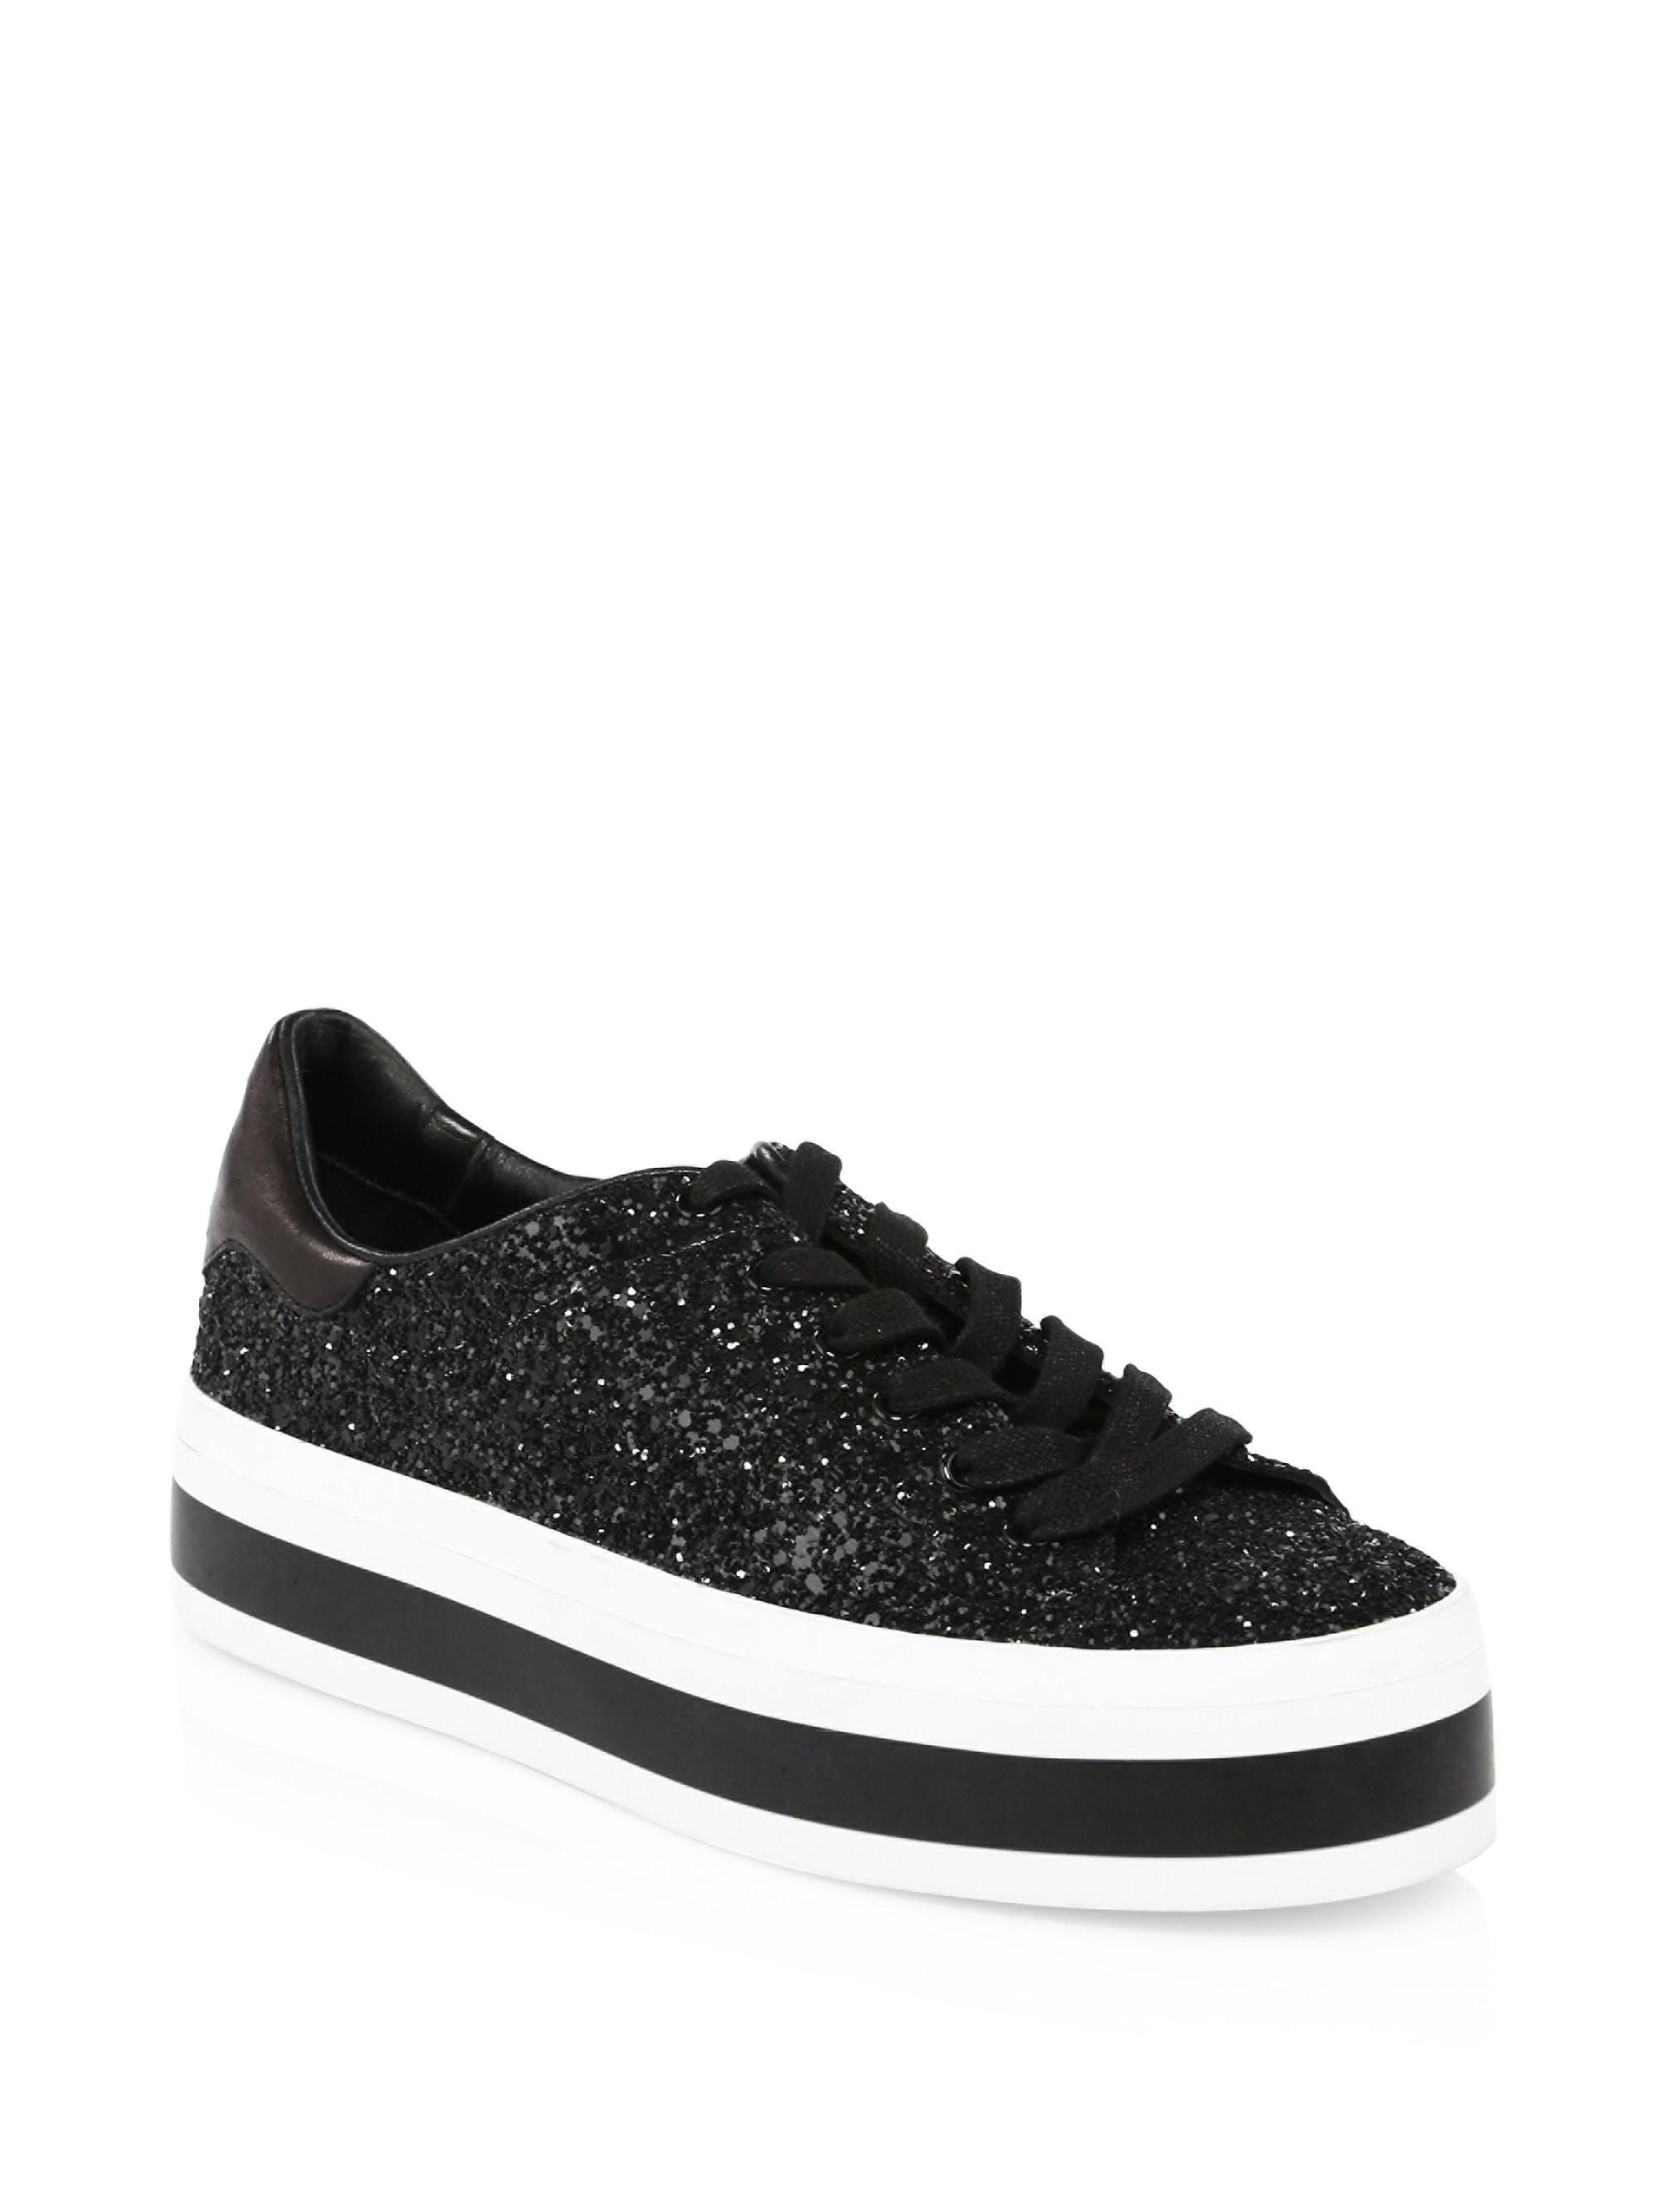 ALICE+OLIVIA Ezra Glitter Leather Platform Sneakers mewetTcY